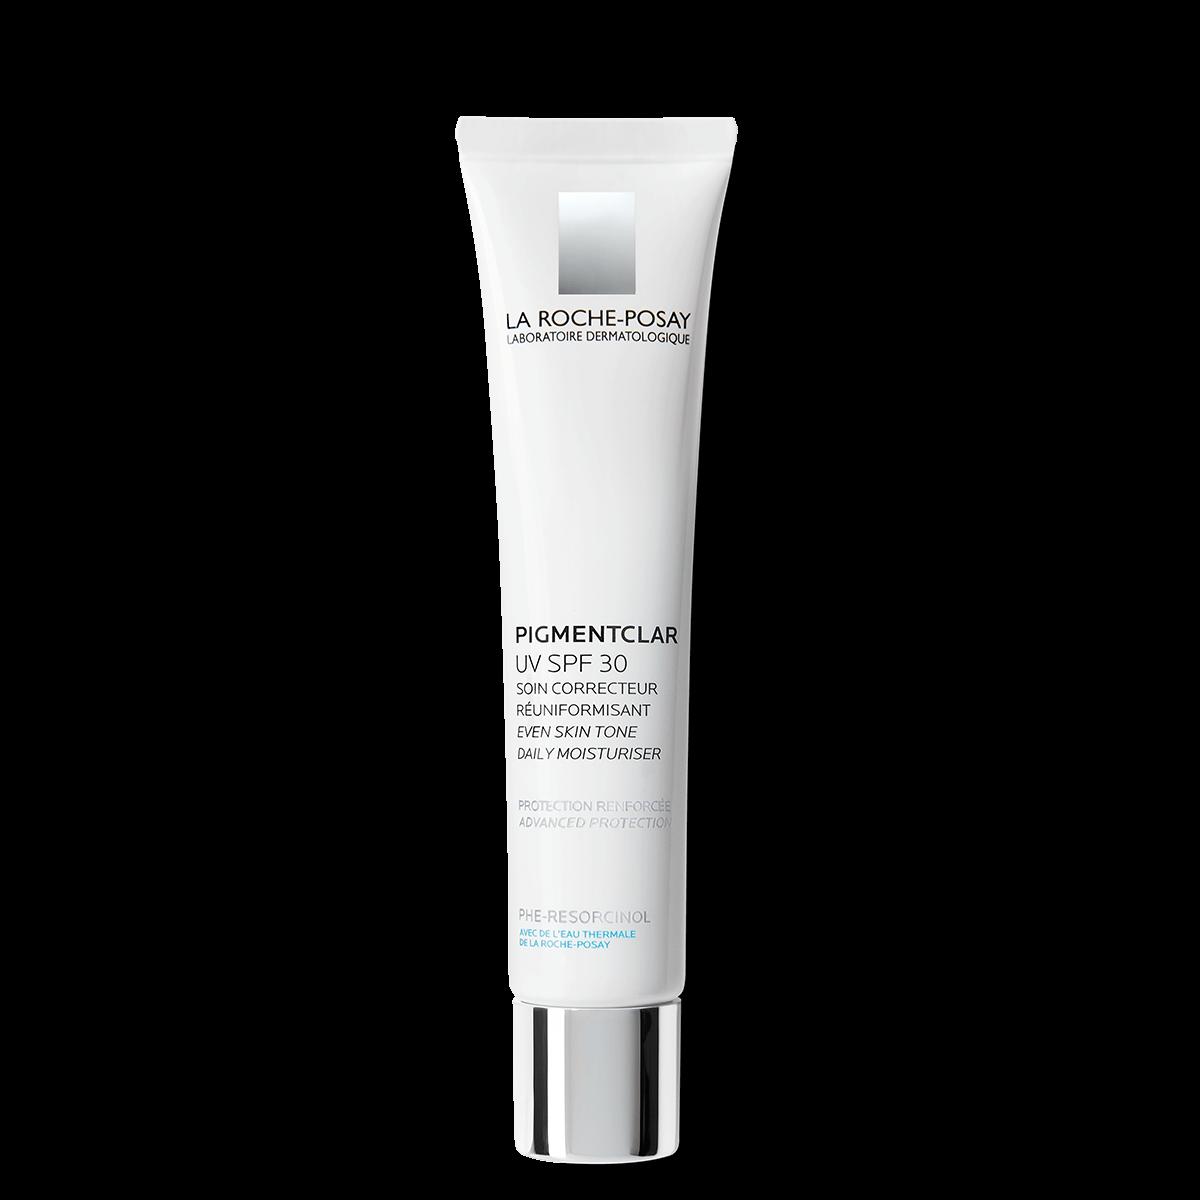 La Roche Posay ProduktSide Anti Aging Pigmentclar UV Spf30 Moisturizer